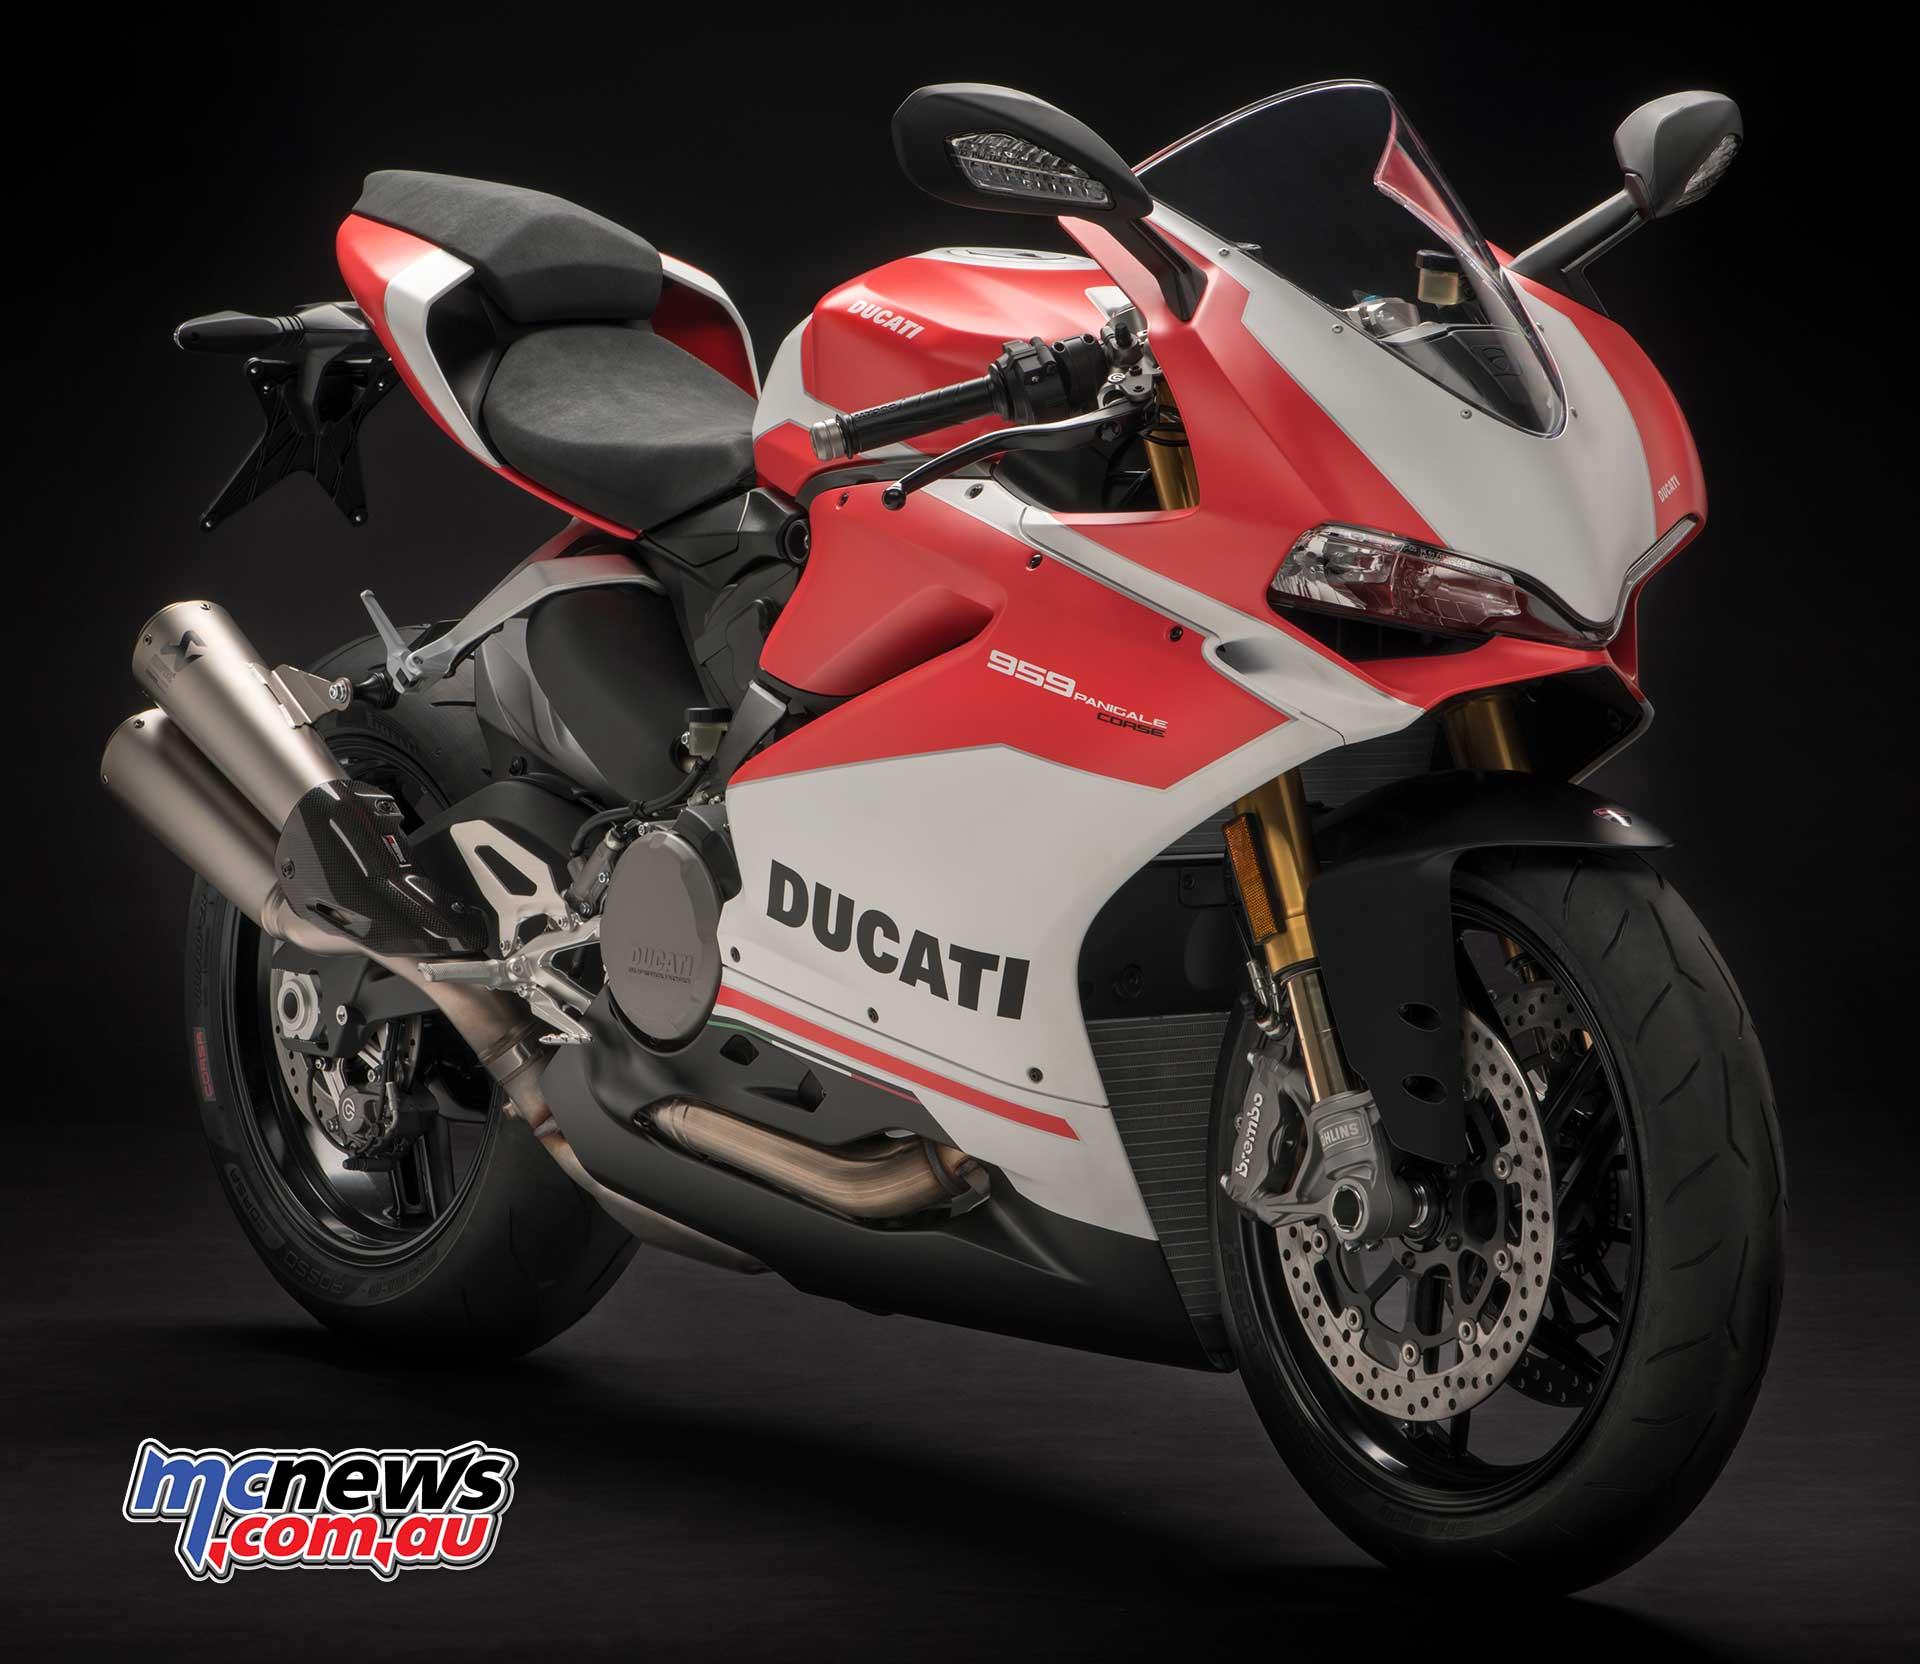 2018 Ducati Panigale 959 Corse Edition Mcnewscomau